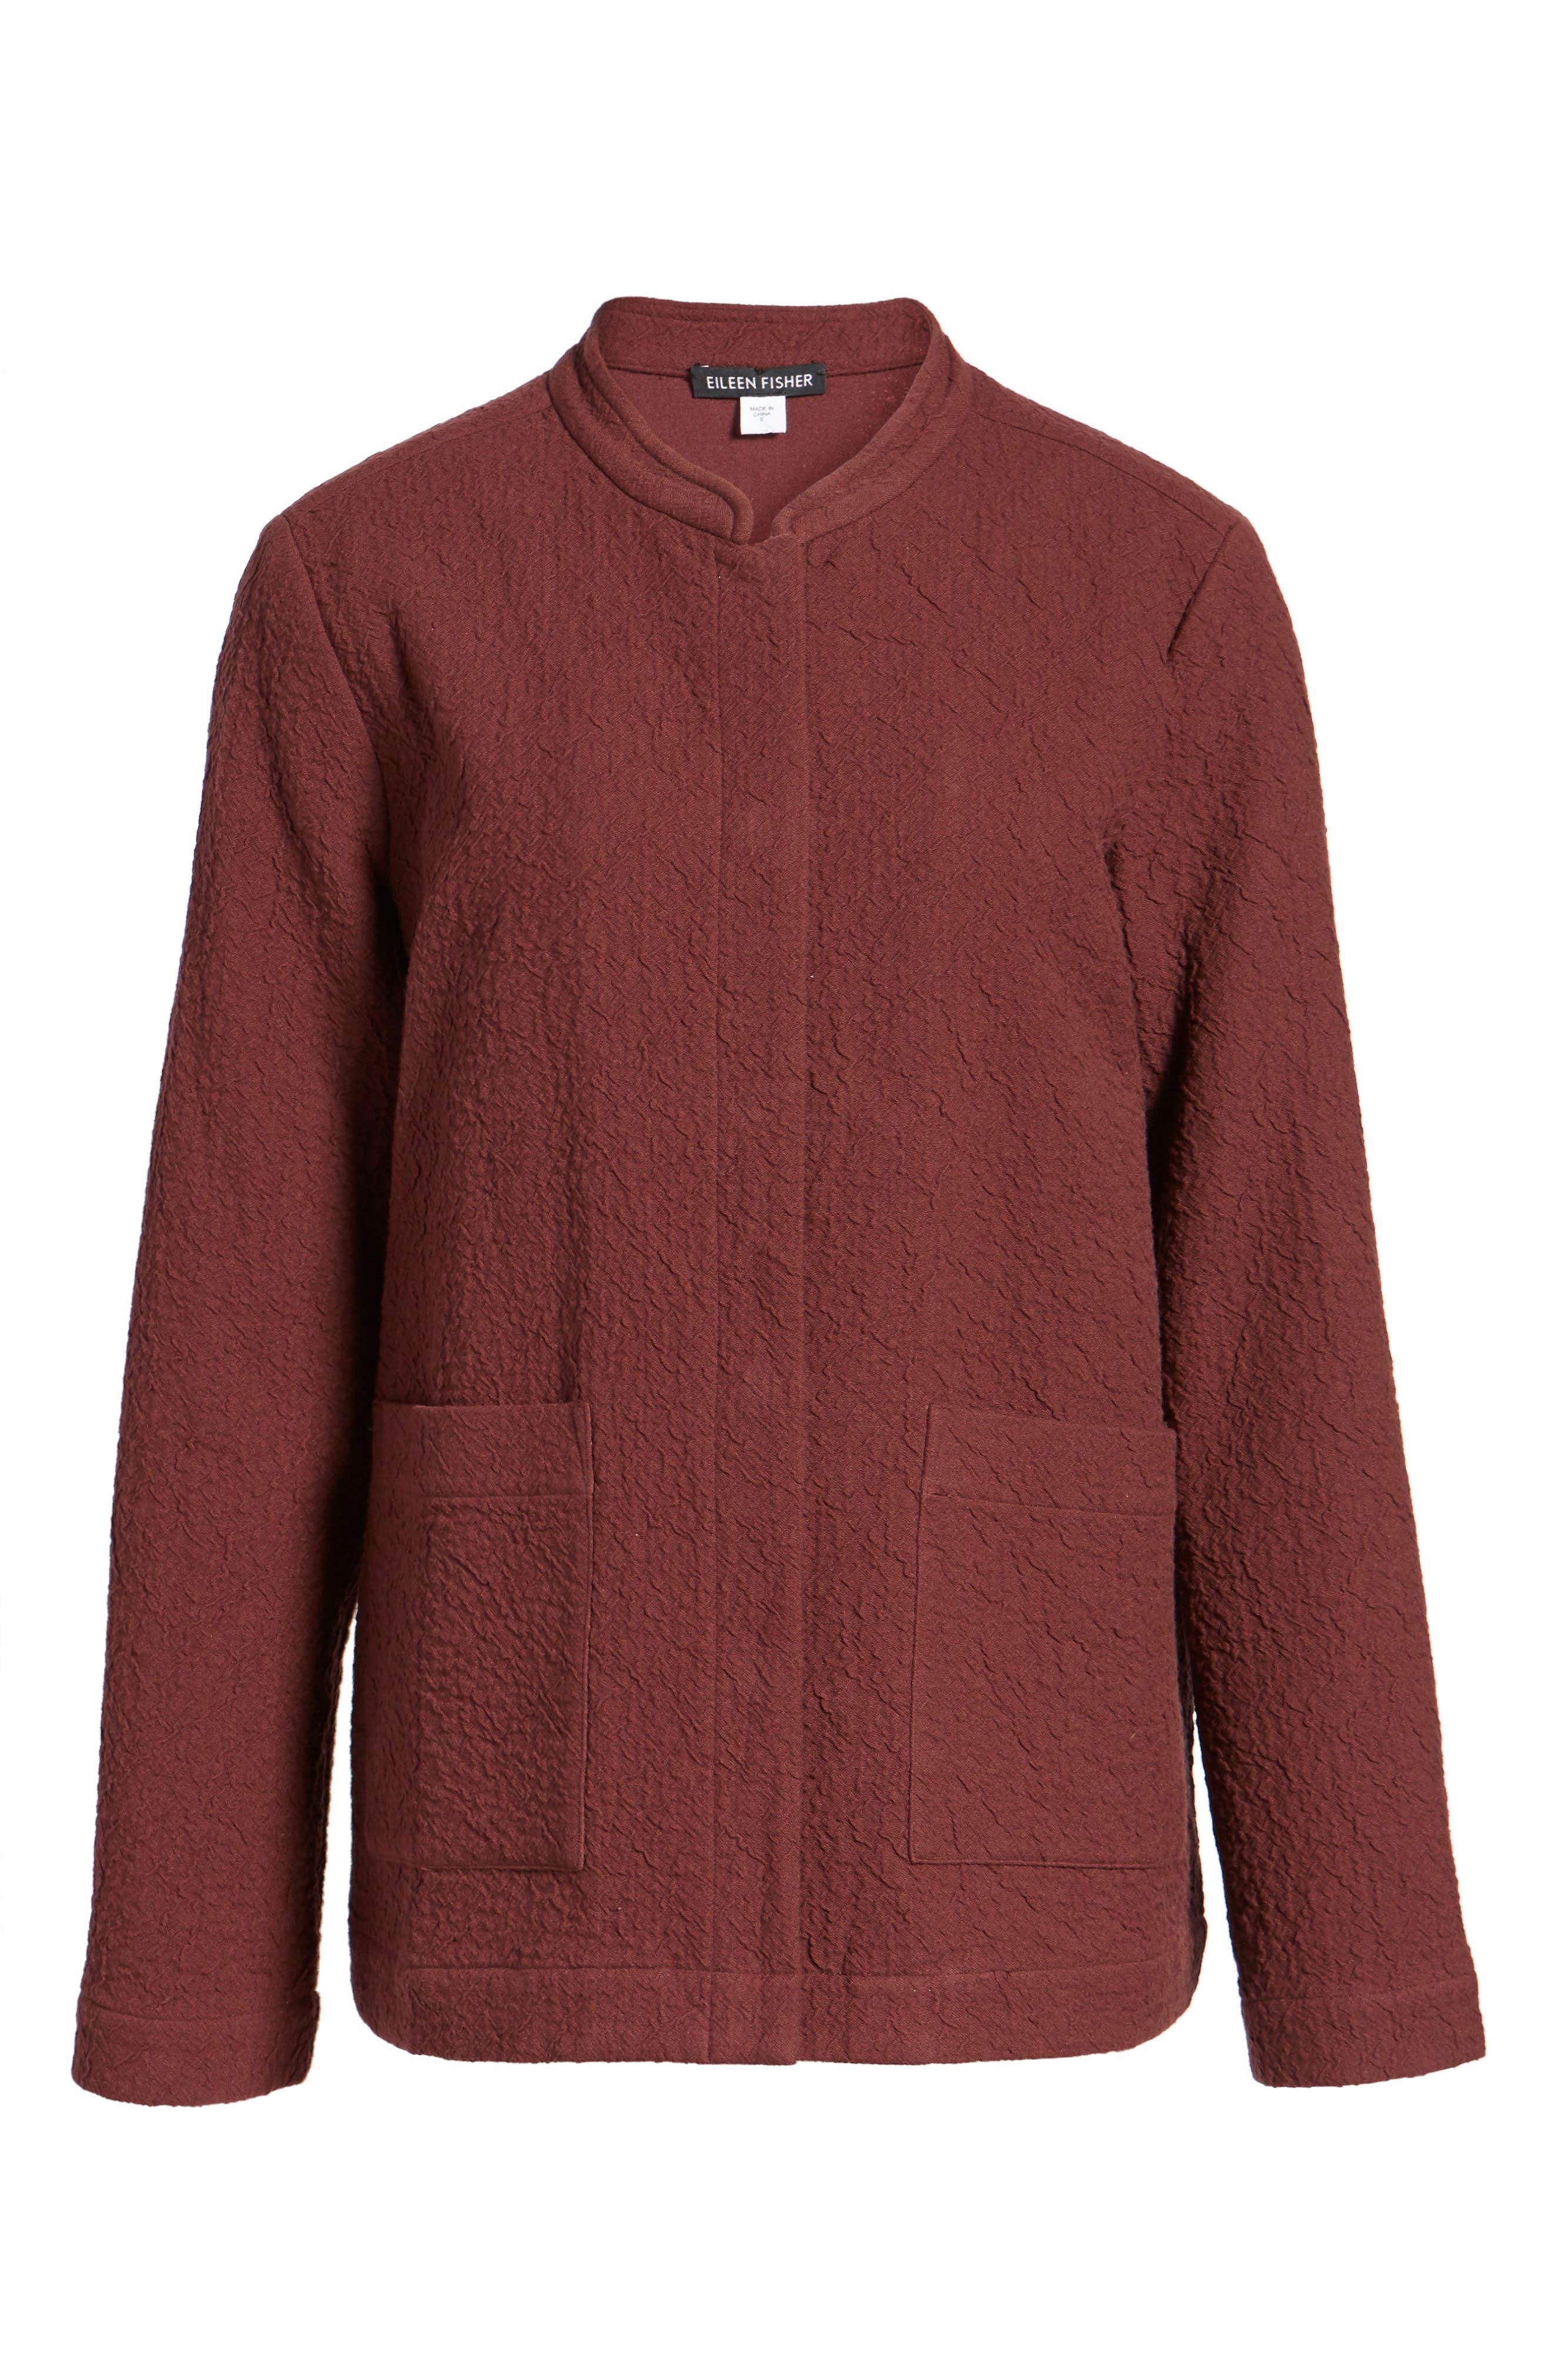 Organic Cotton Jacket,                             Alternate thumbnail 5, color,                             623